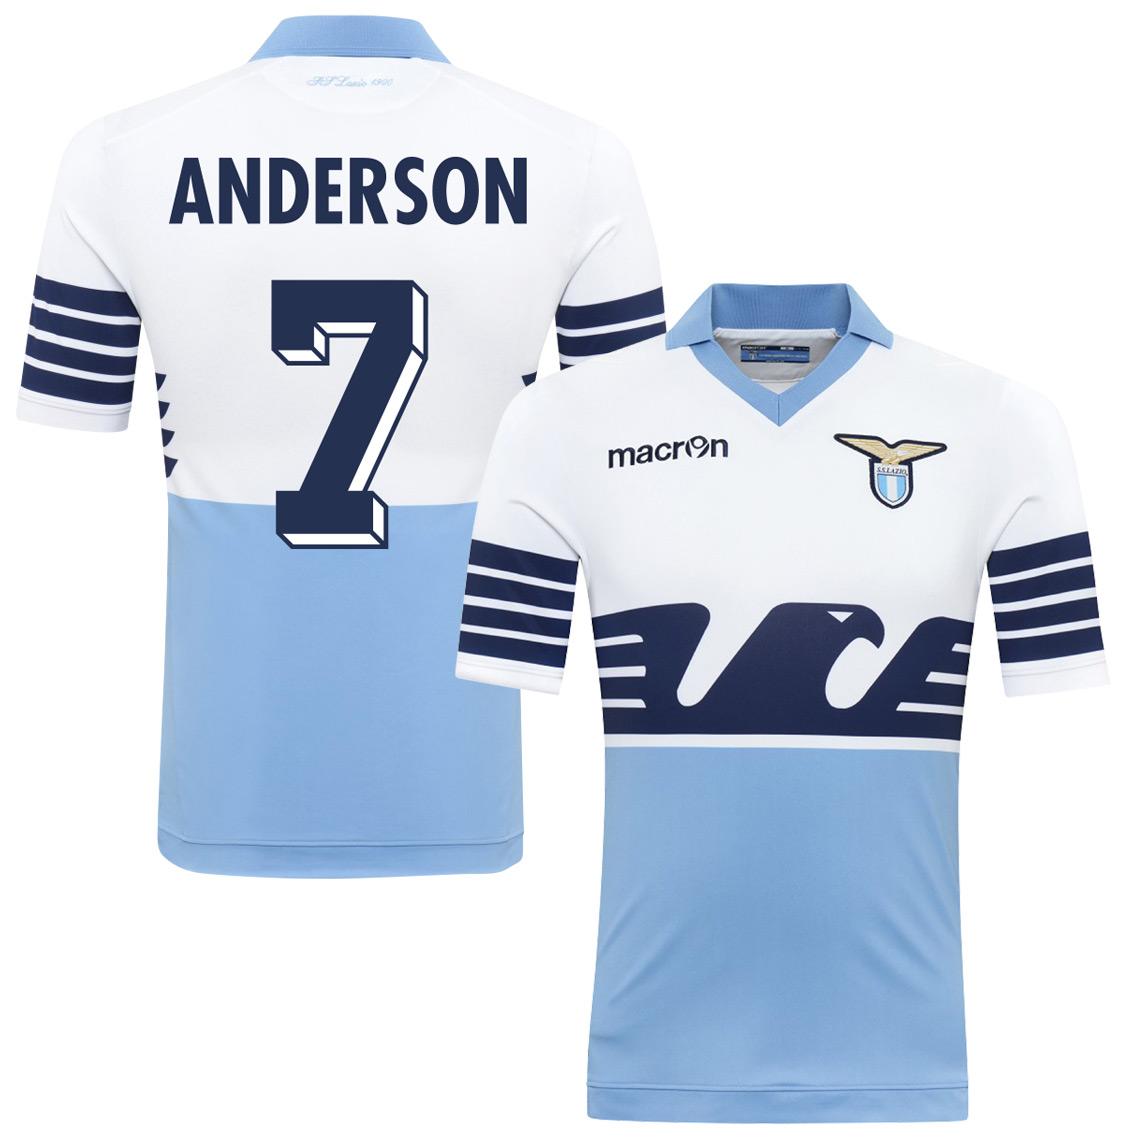 2015 Lazio 115 Year Anderson Jersey (Fan Style Printing) - M